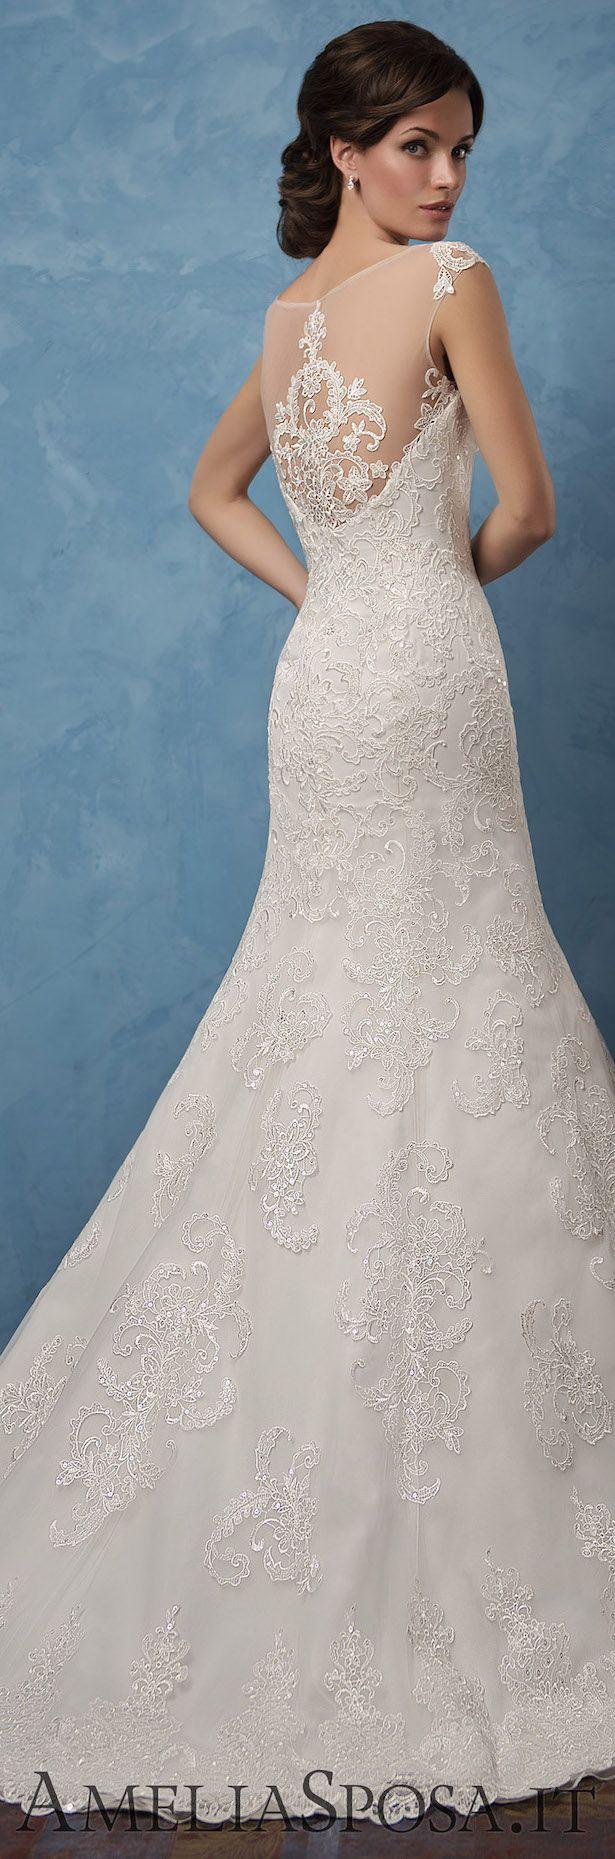 352 best Wedding dresses images on Pinterest | Short wedding gowns ...